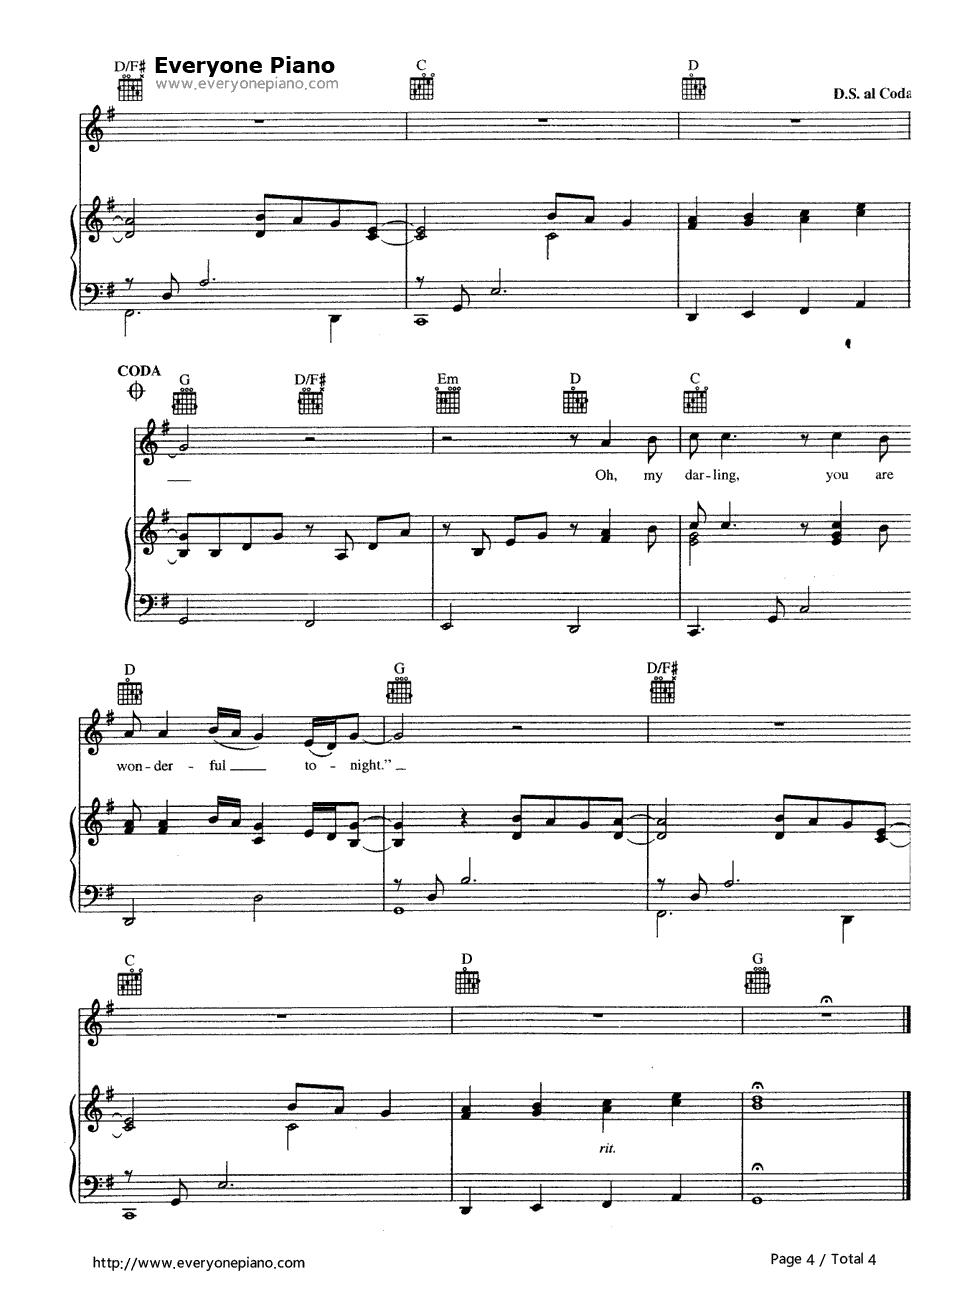 Wonderful Tonight Eric Clapton Free Piano Sheet Music Piano Chords